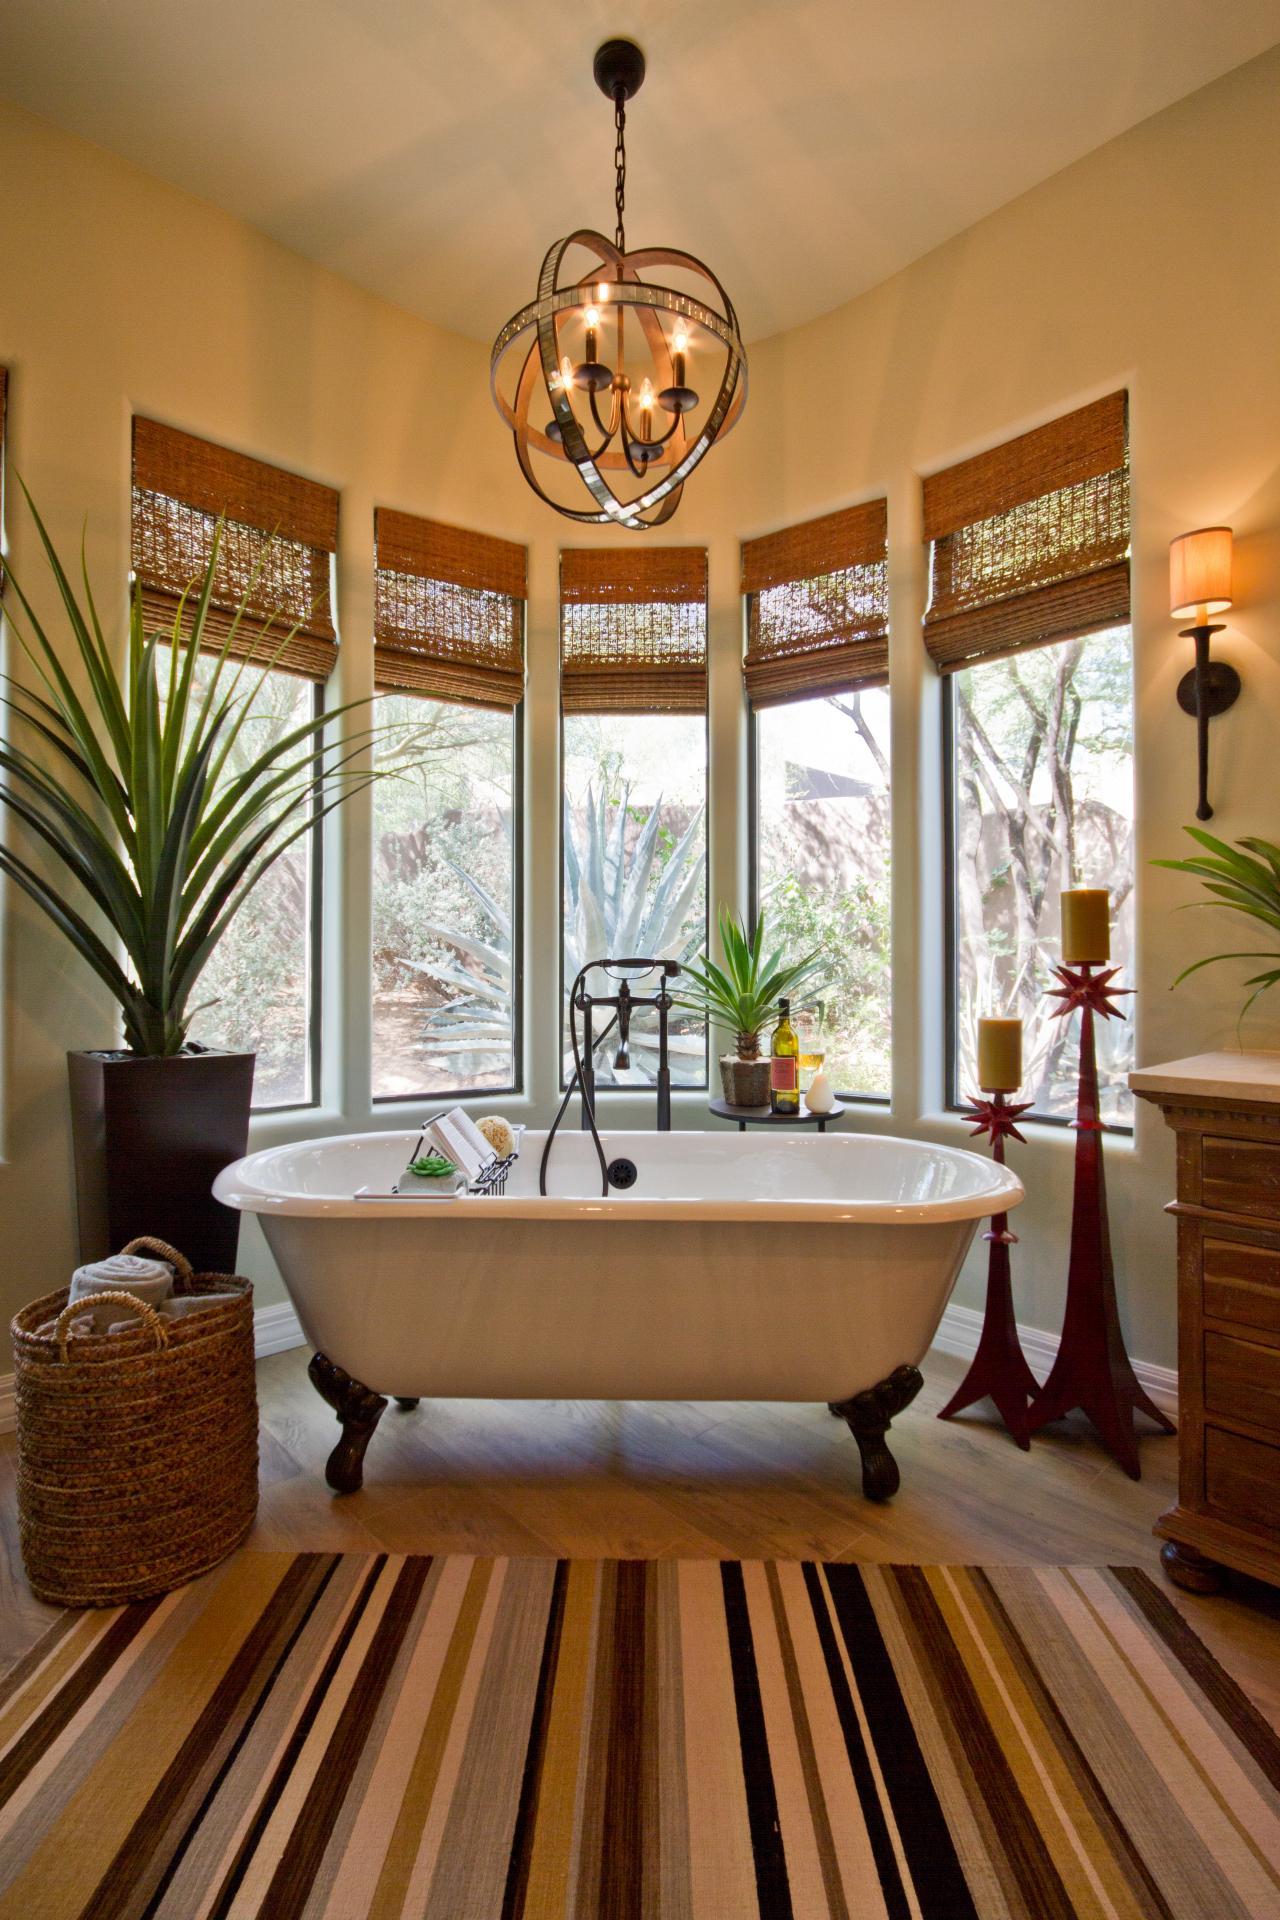 25 Southwestern Bathroom Design Ideas The Wow Style